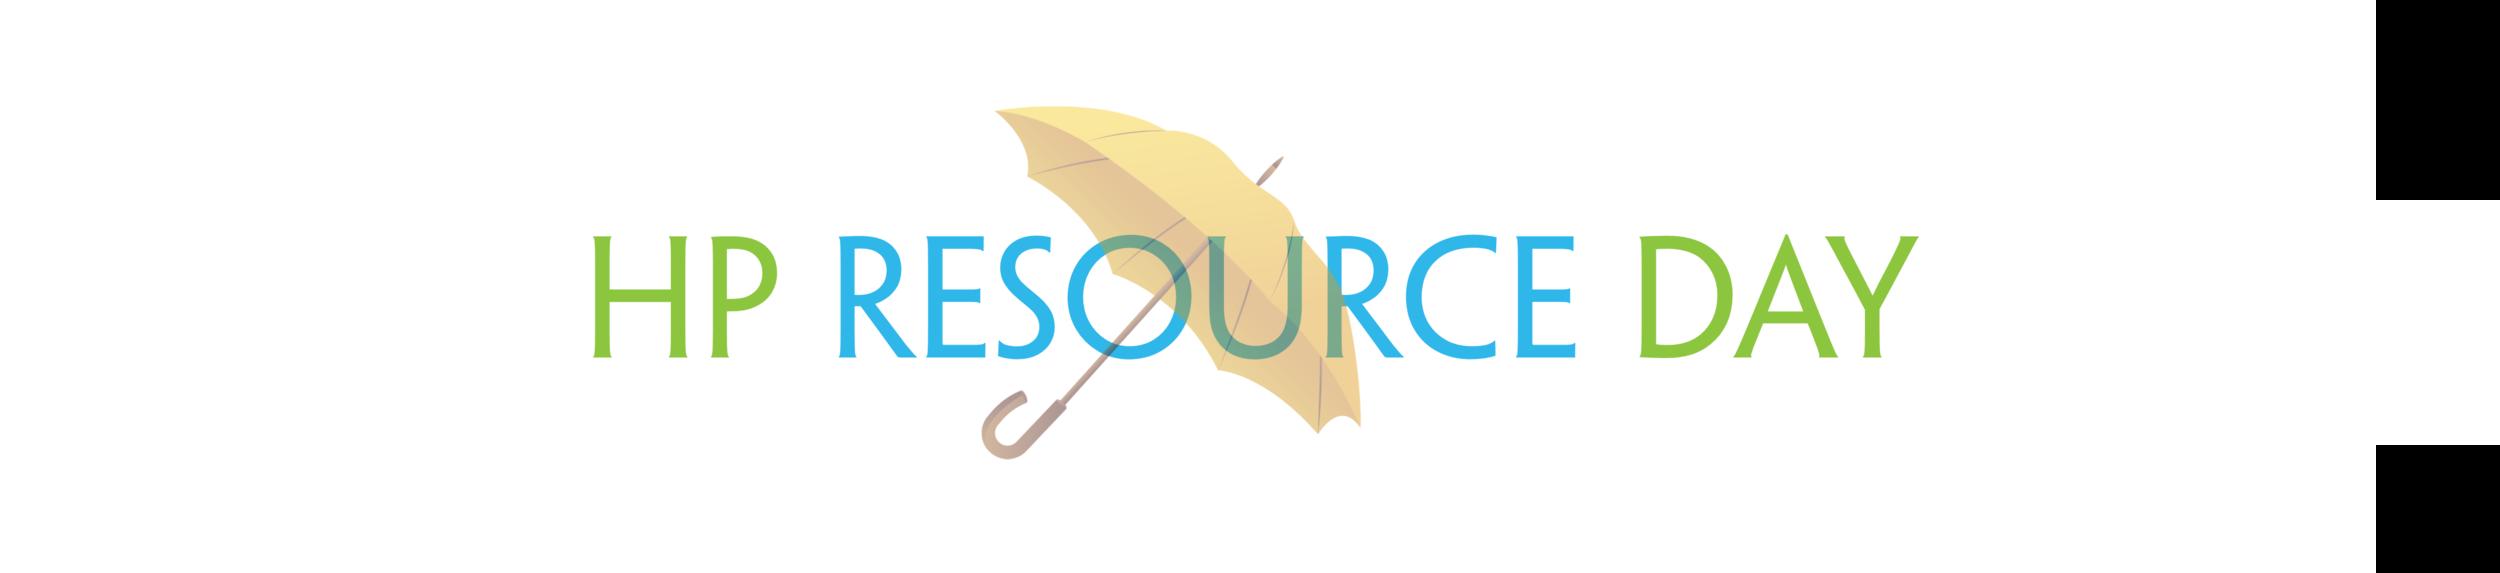 Health Professons Resource Day 2018 — Inland Health